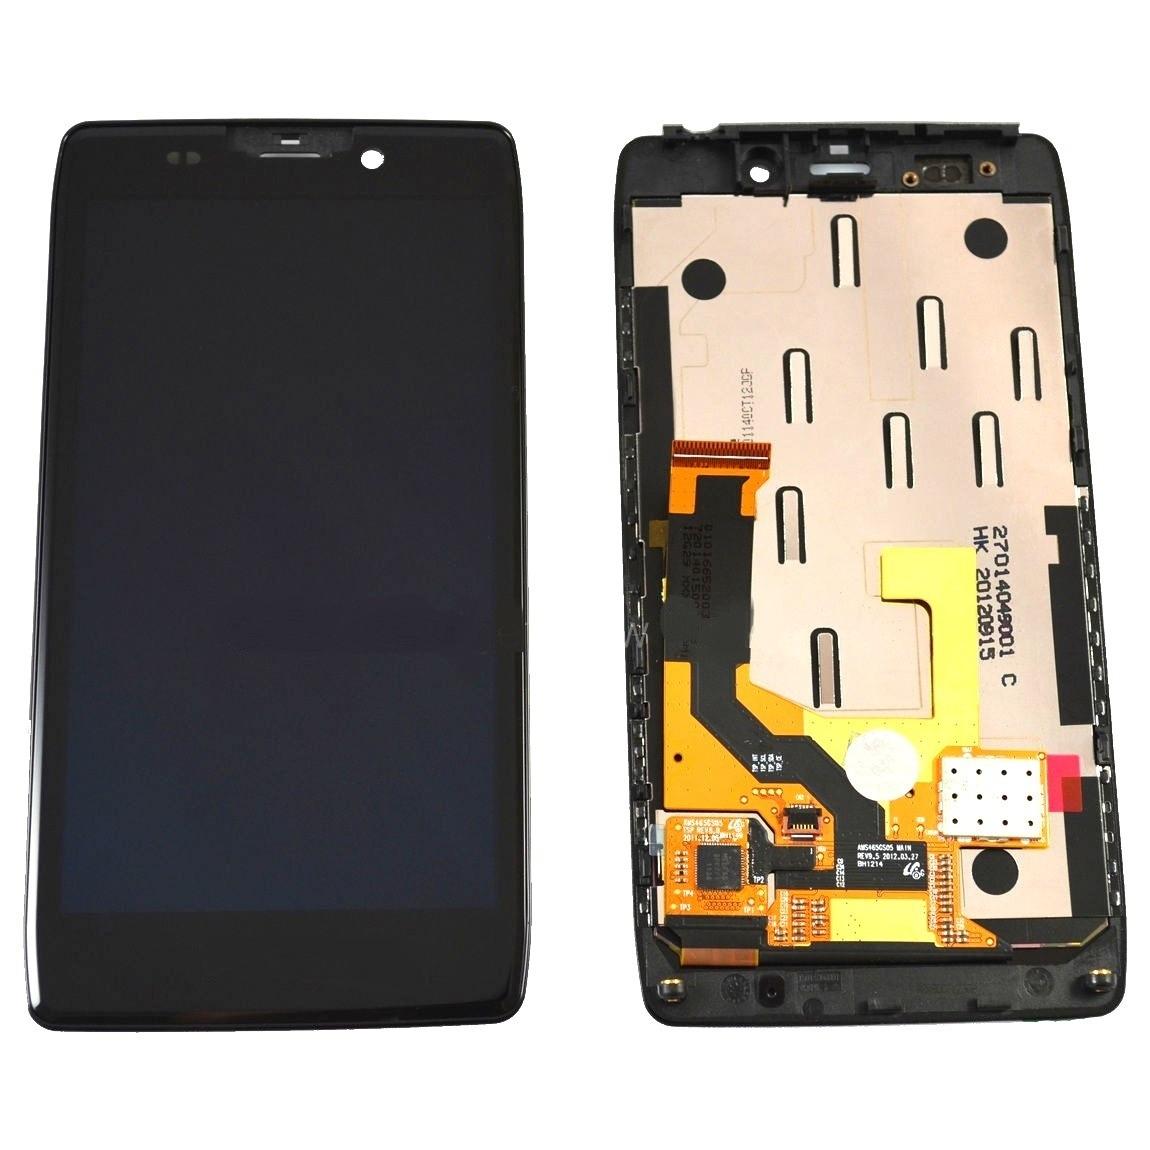 Tela Touch Display Lcd Motorola Razr Hd Xt925 Original